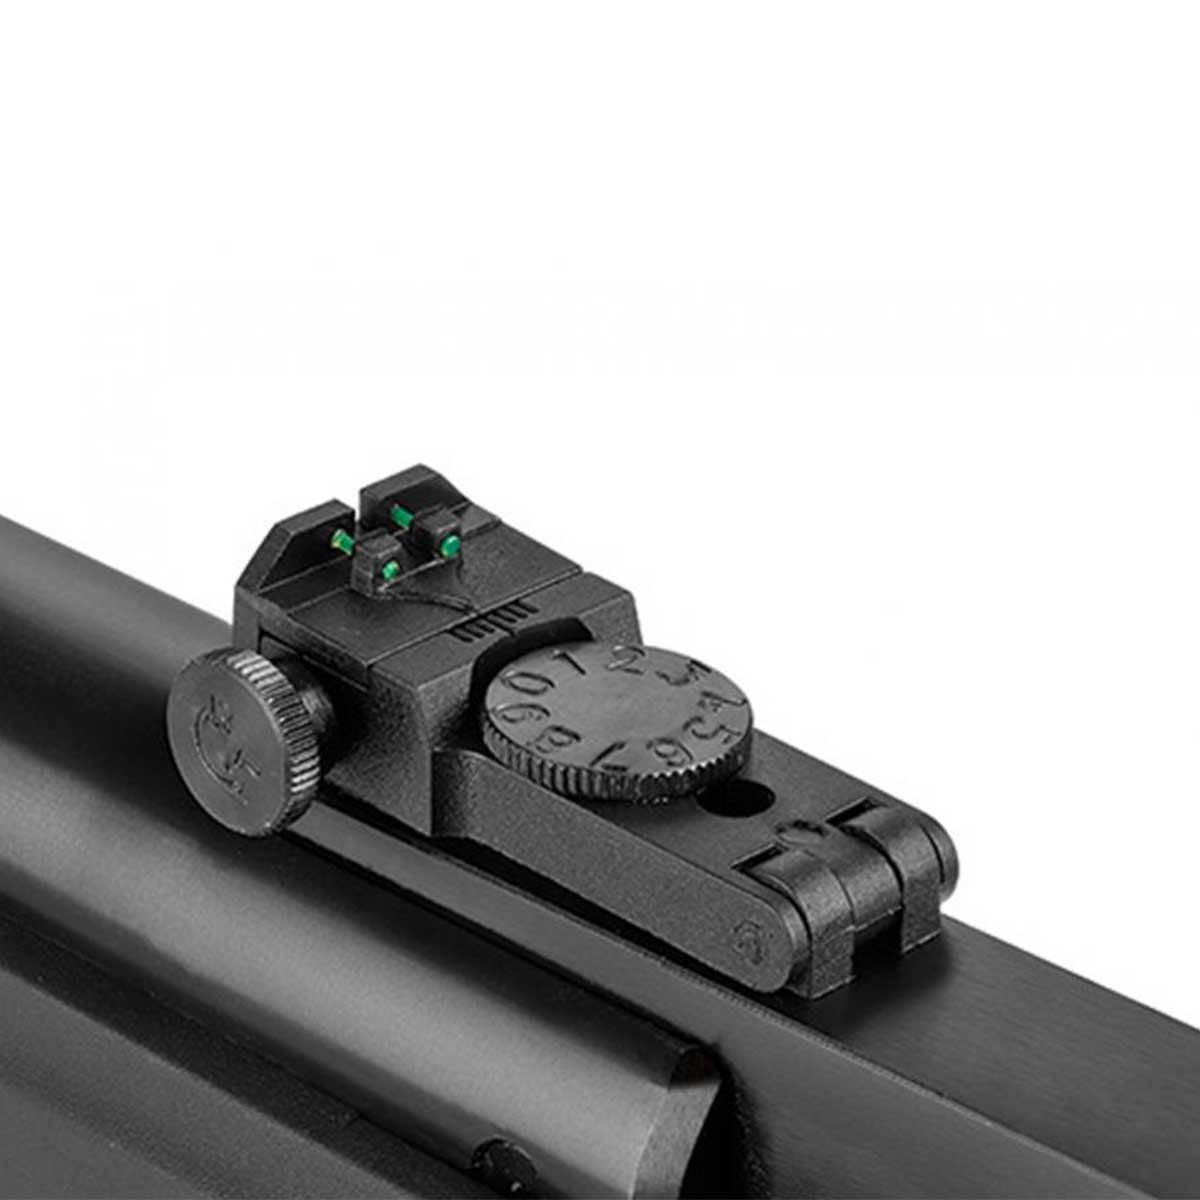 Carabina de Pressão Rossi Hatsan HT 80  5,5mm+Capa+Pistão+Óculos+Chave Allen